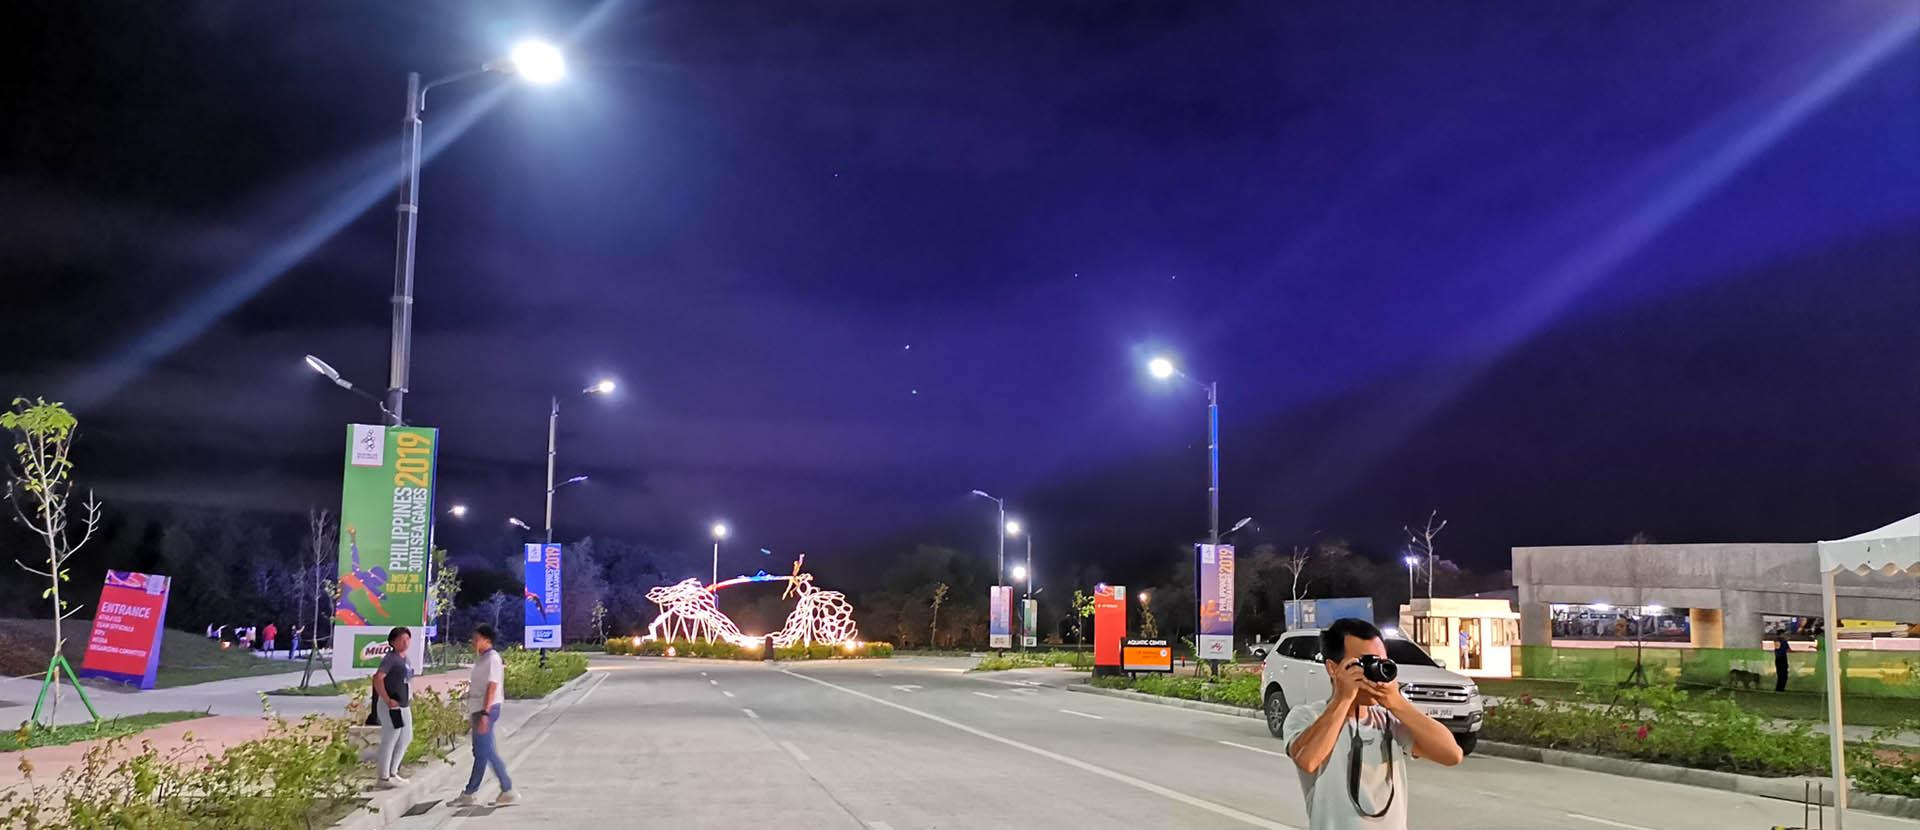 Led CB IECEE street light